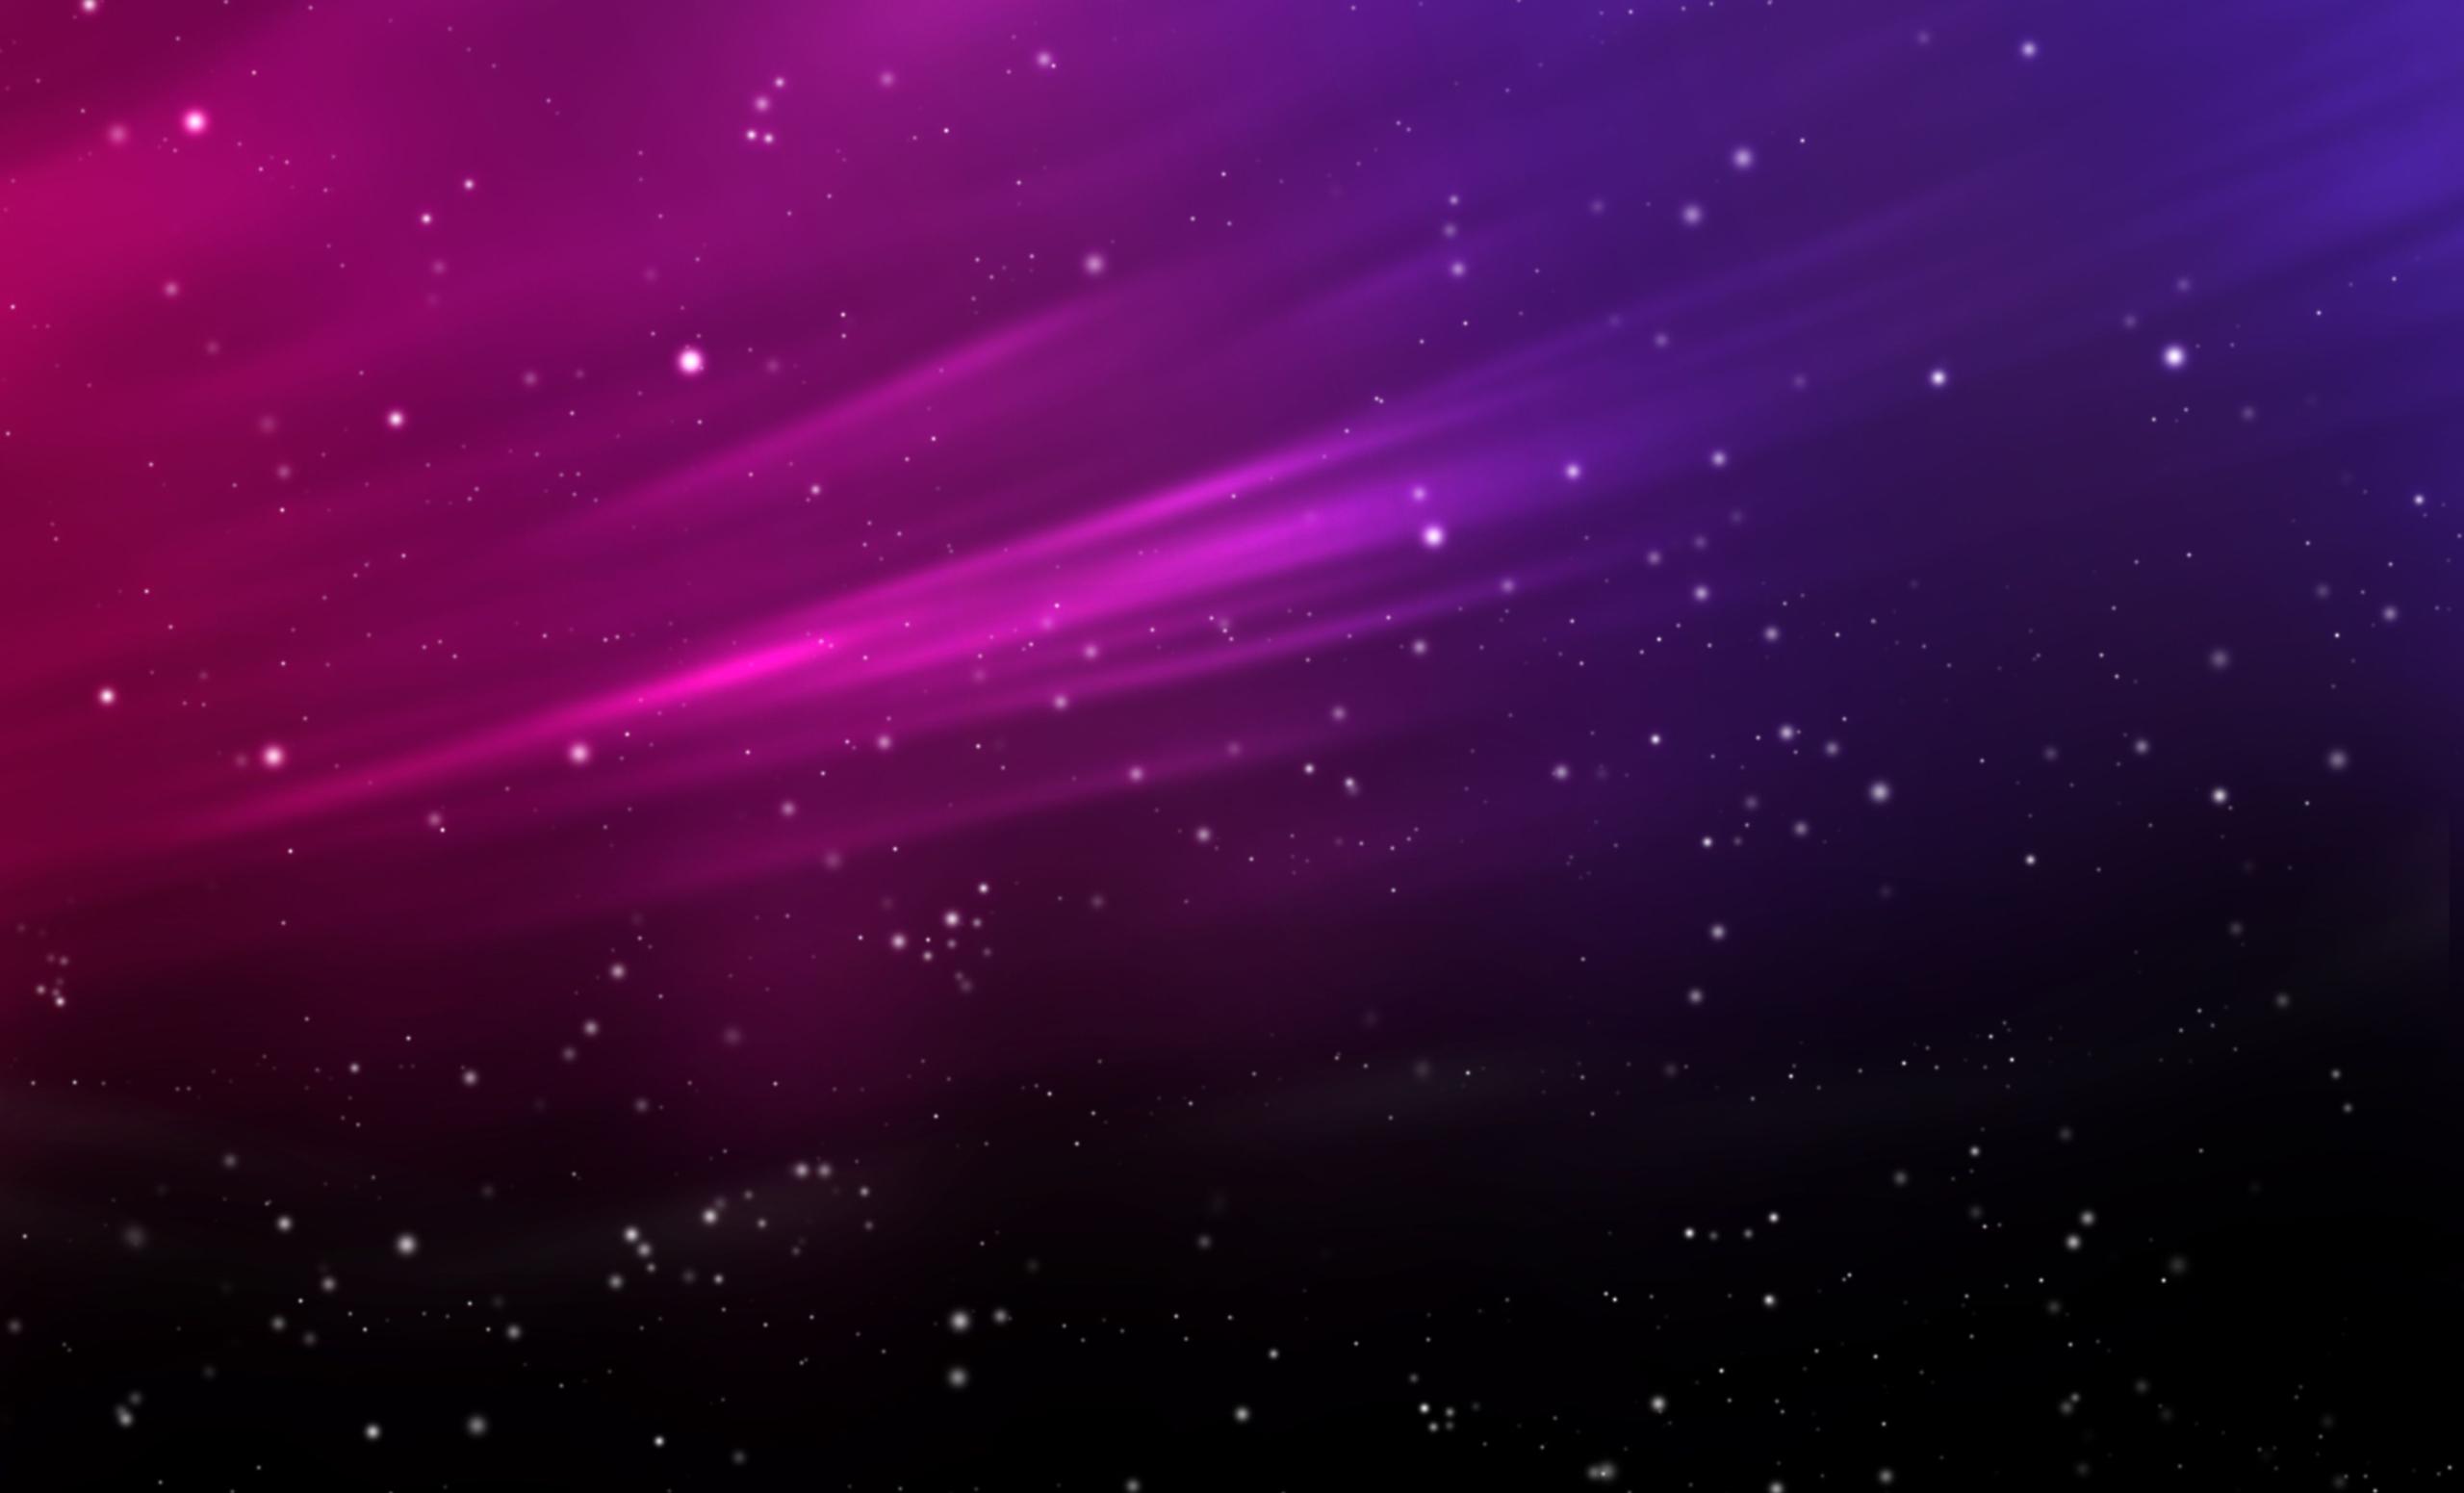 Awesome Purple Desktop Picture design Ideas